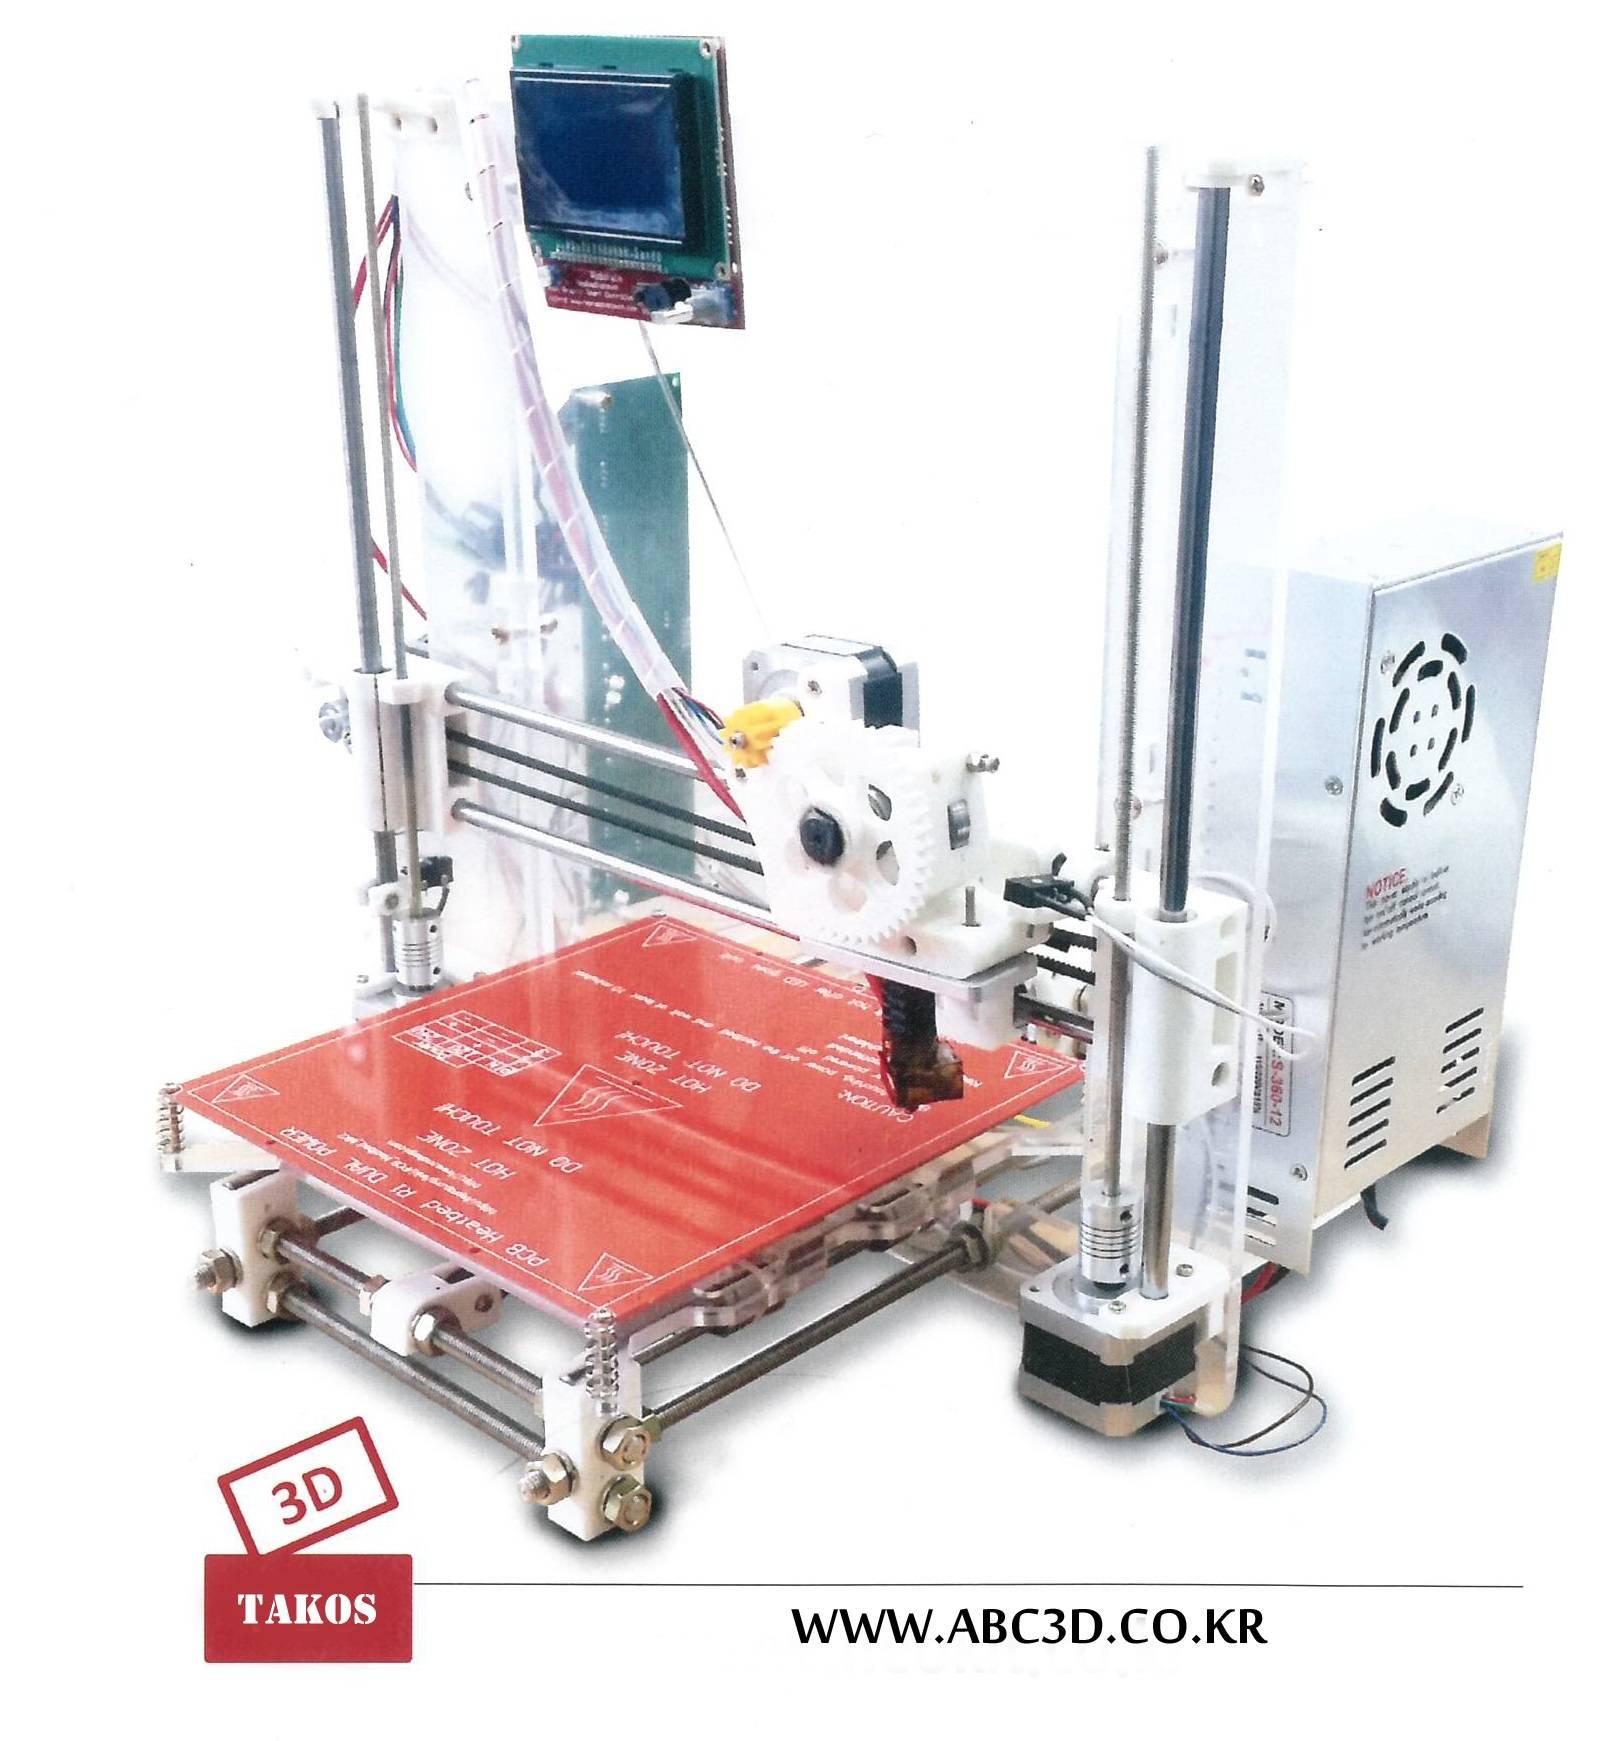 ABC3D Printer